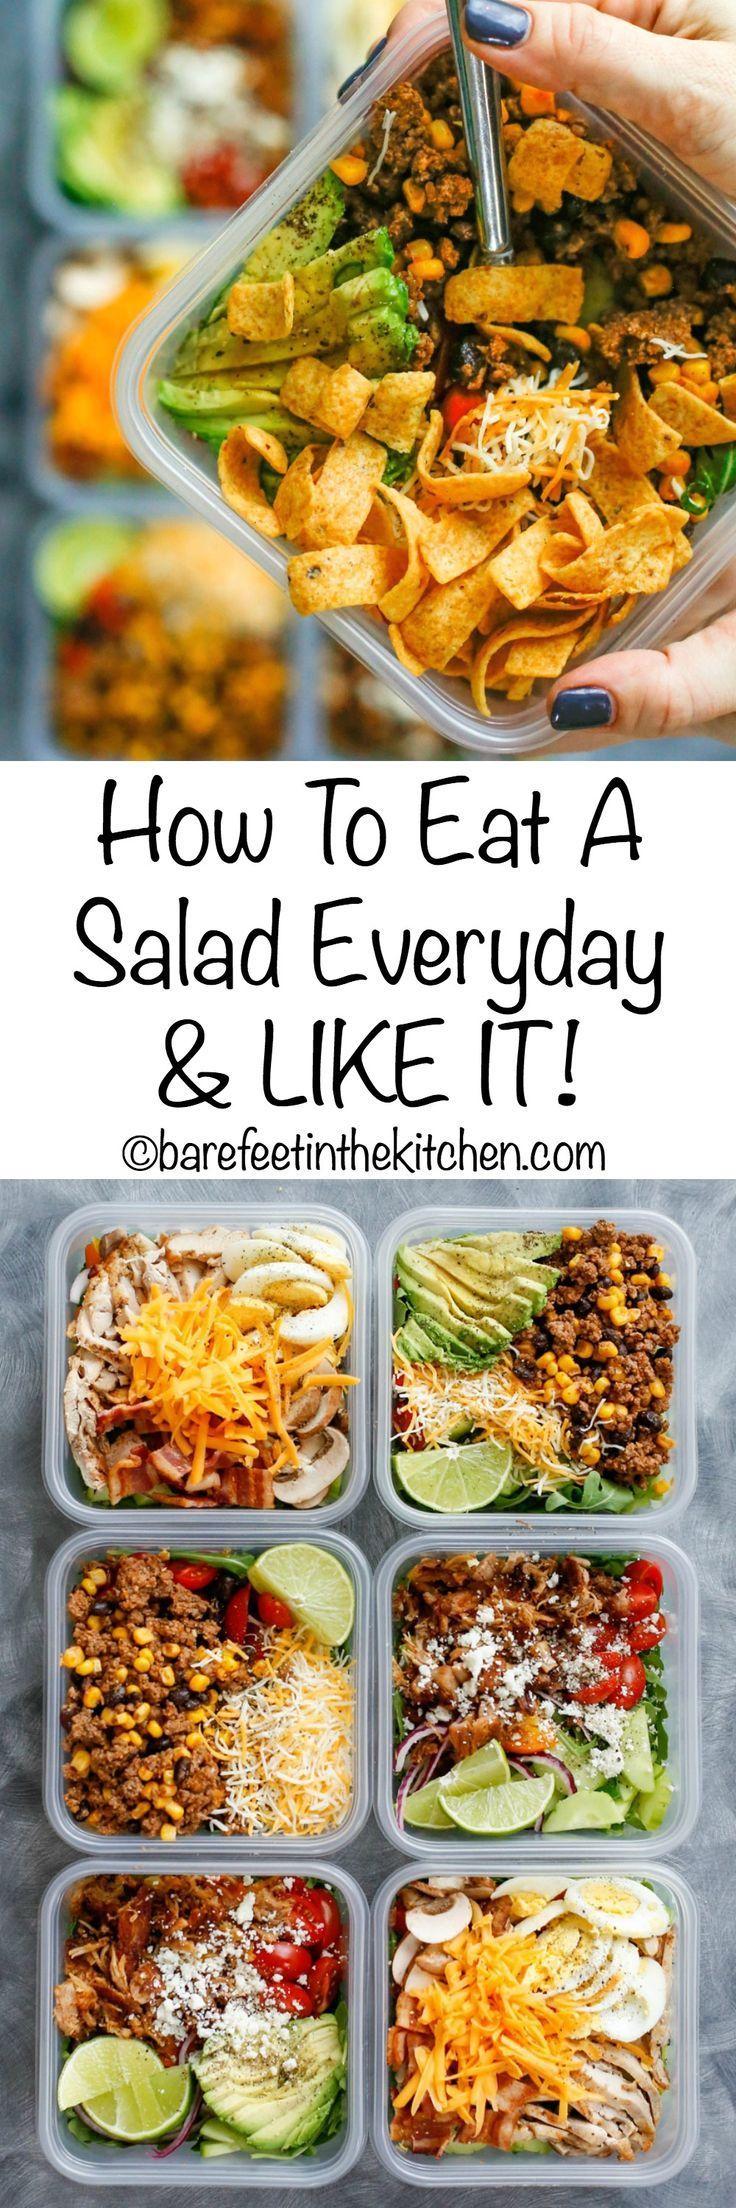 NEW Everyday Diet Plan